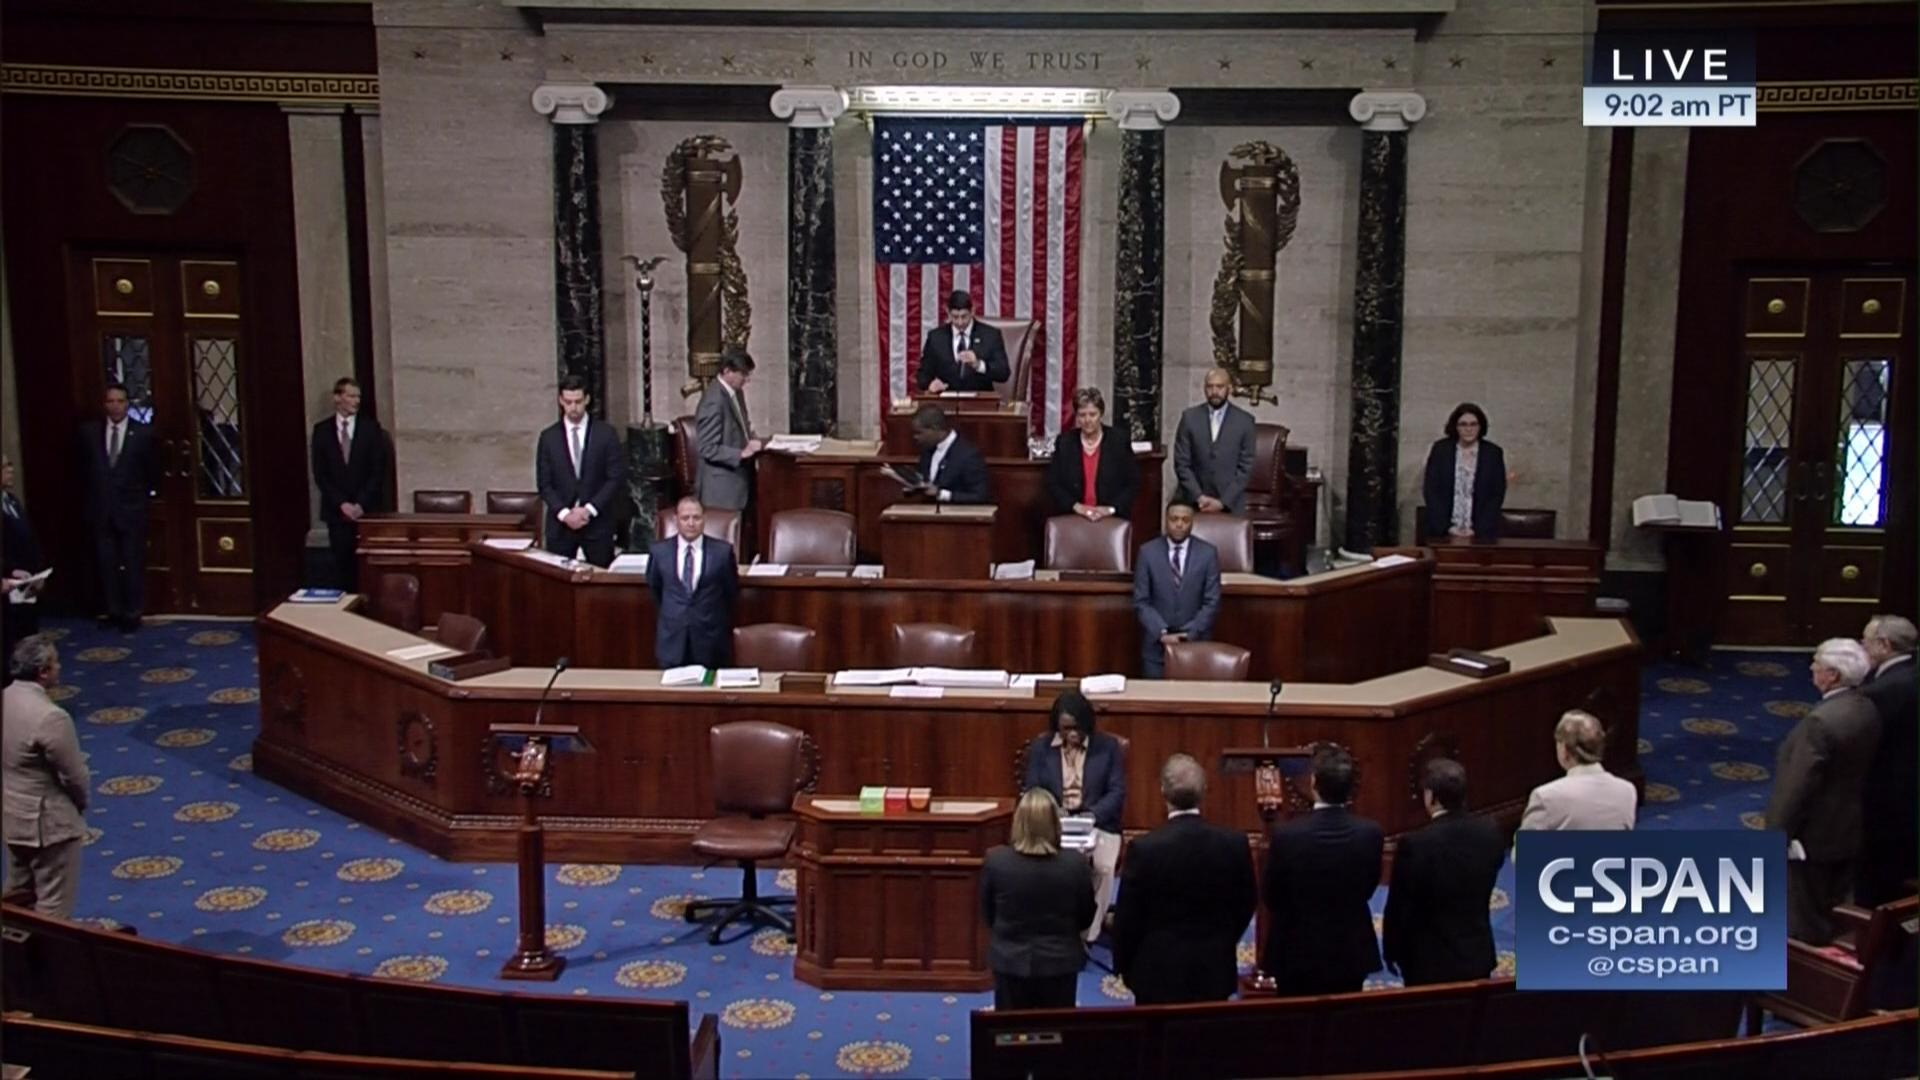 Rev Kevin Ross Opening Prayer House Representatives